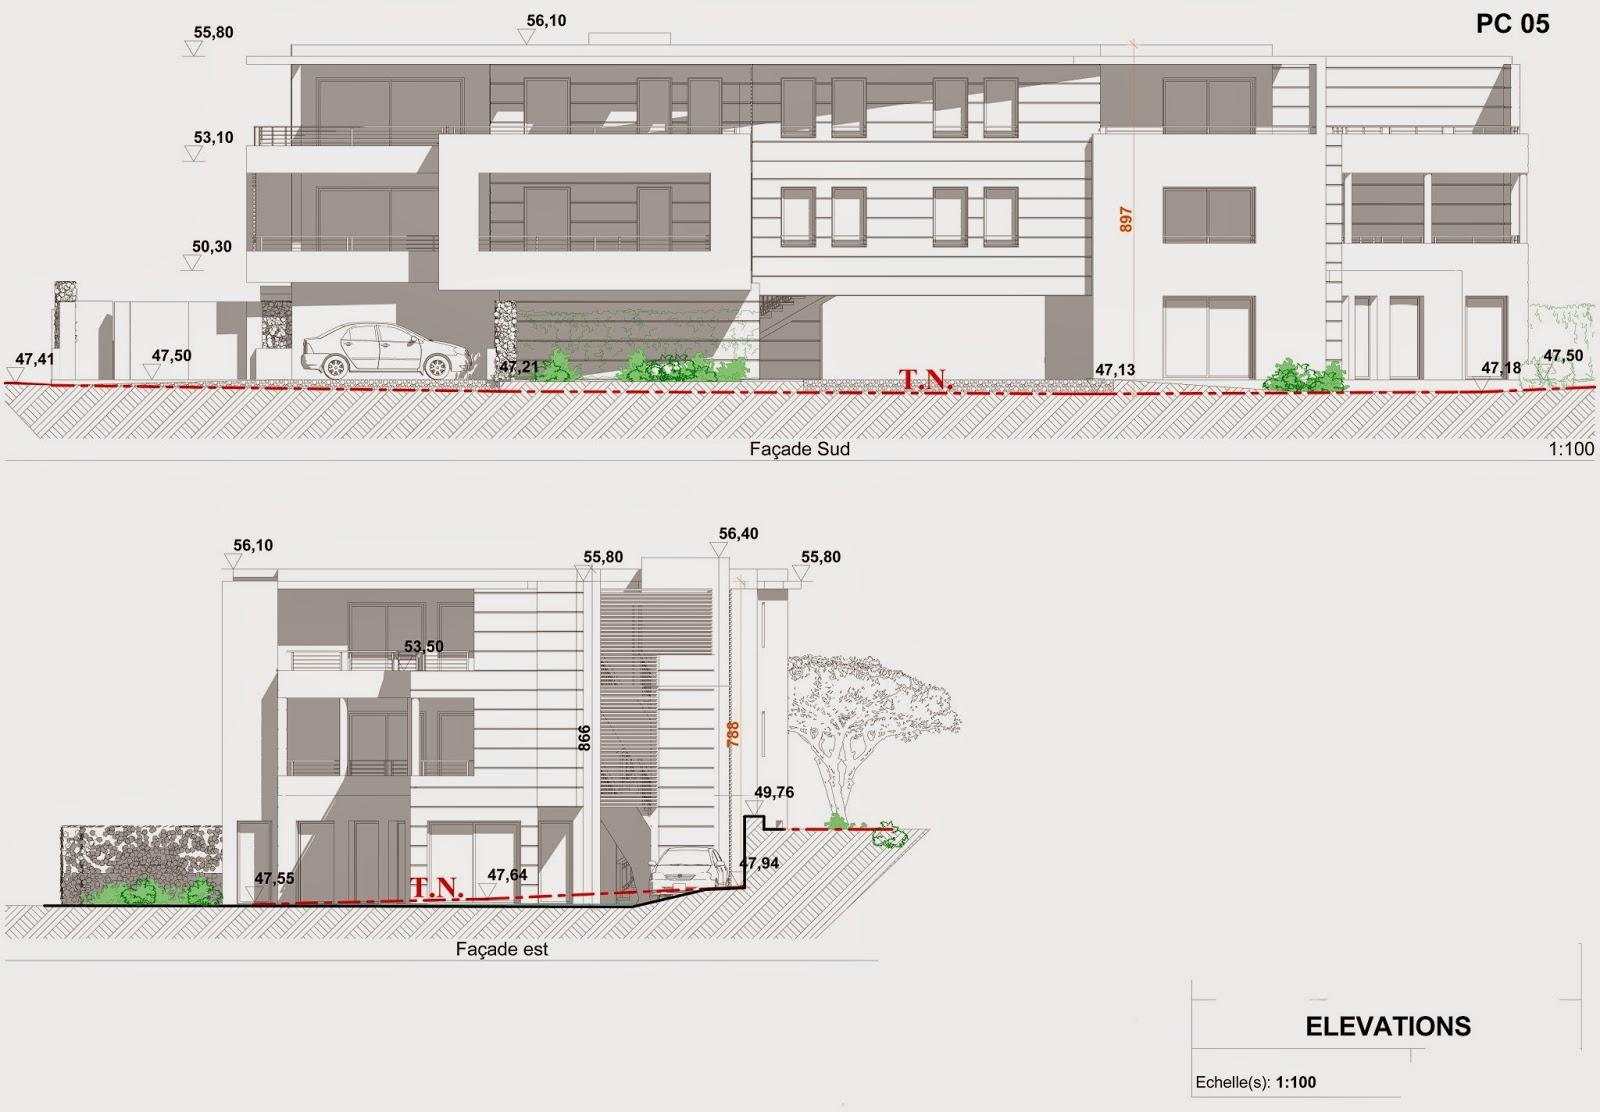 les terrasses de l 39 escourche plans permis de construire. Black Bedroom Furniture Sets. Home Design Ideas